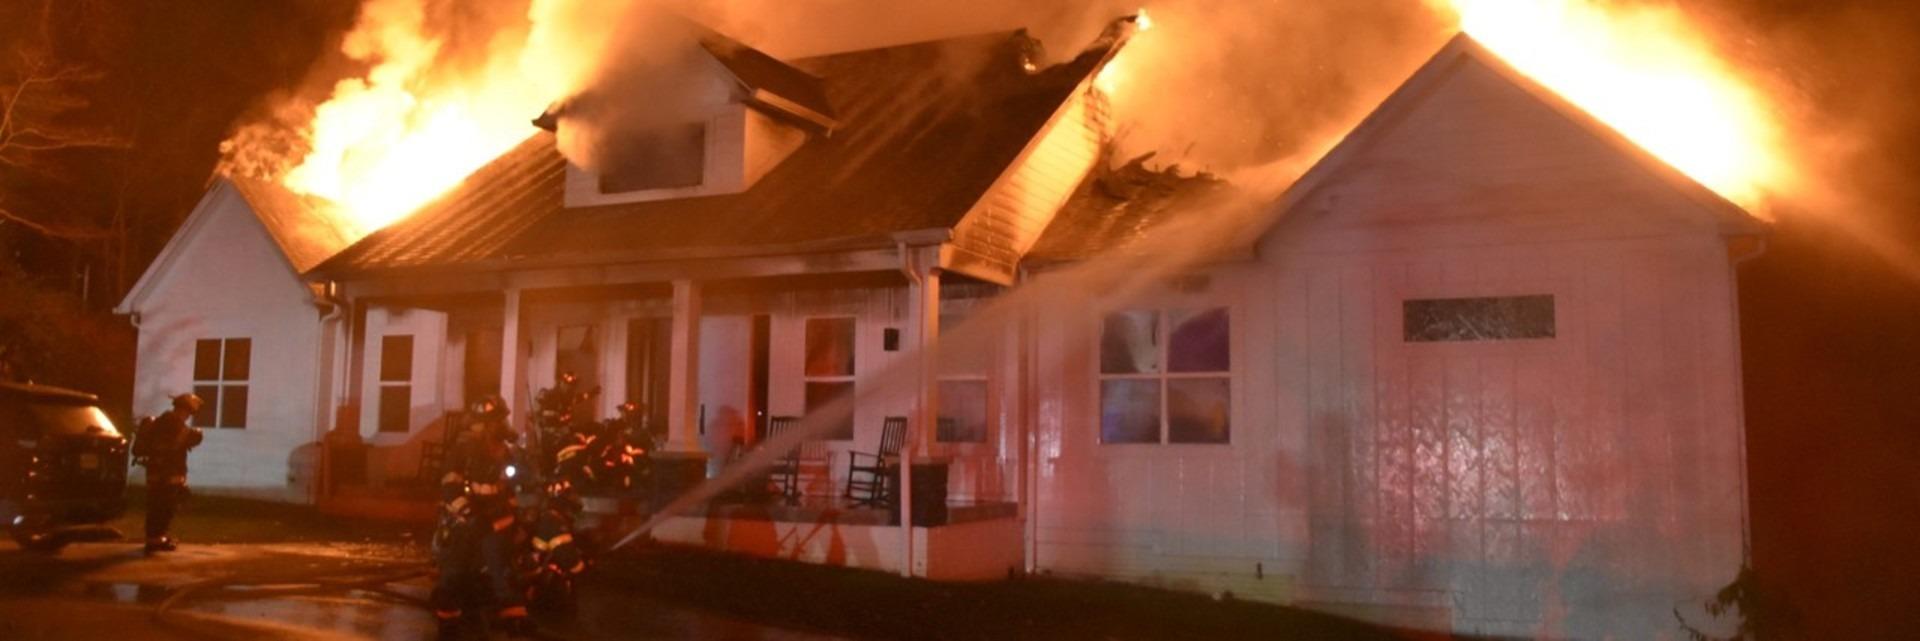 Home Fire Damage